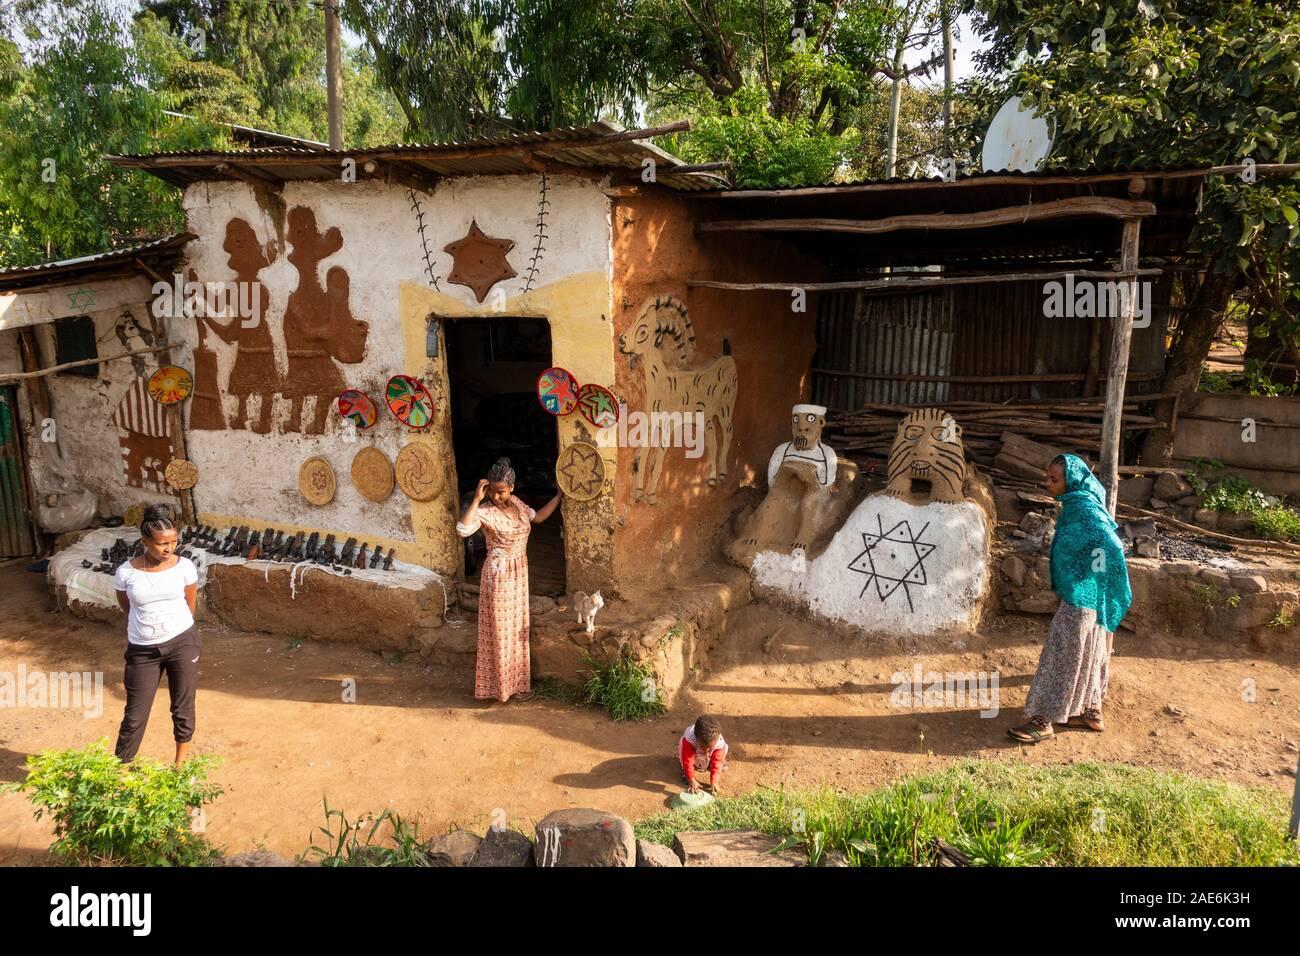 Ethiopia, Amhara Region, Gondar, Wolleka Falasha Jewish Village, decorated crafts shop with Star of David Stock Photo